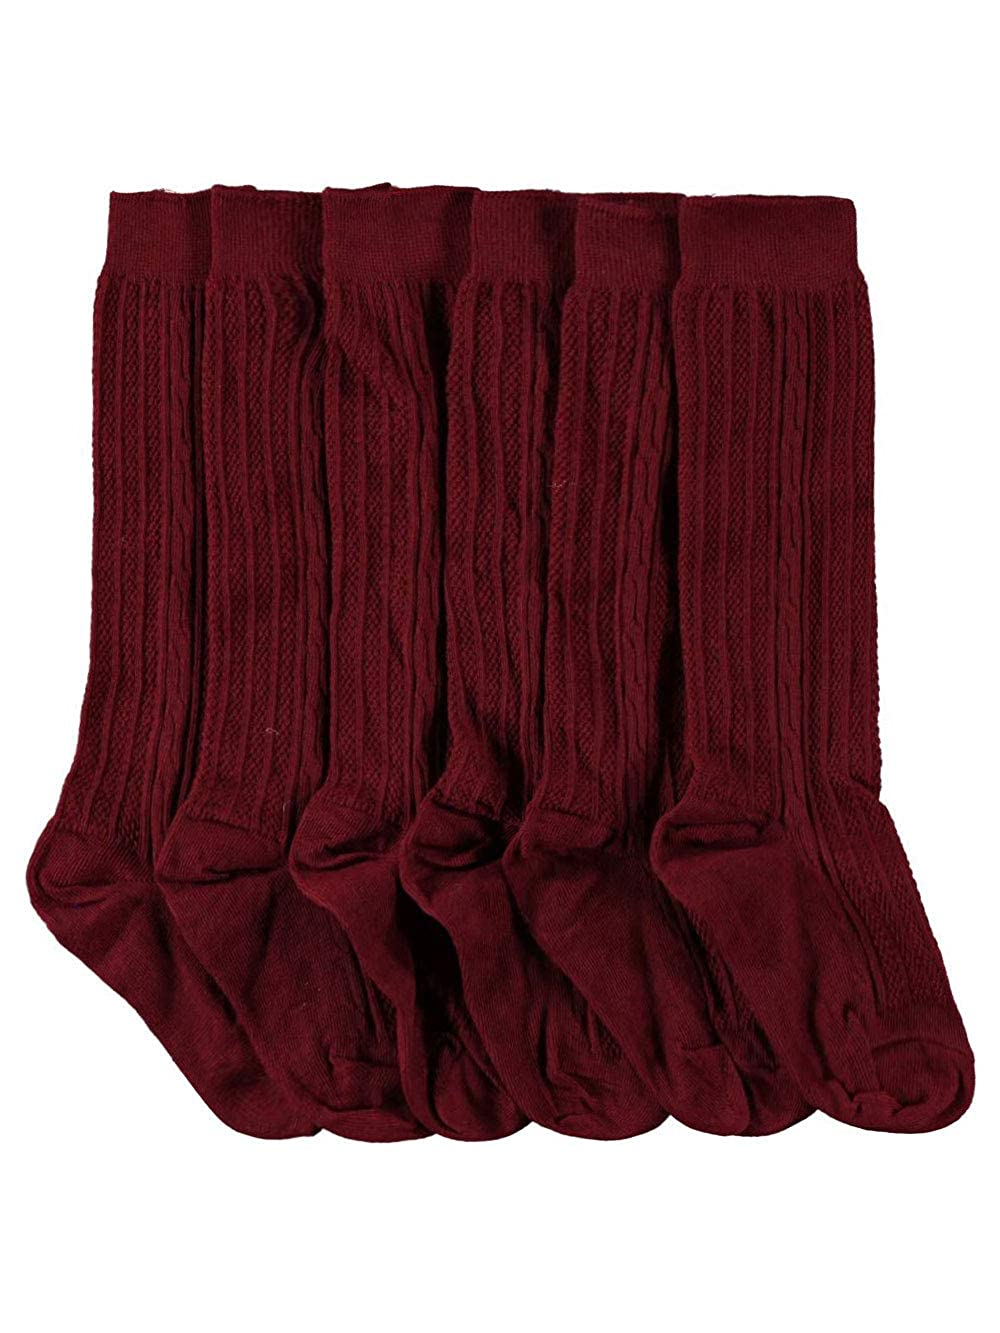 Cookies BrandTexture Cable 3-Pack Dress Socks